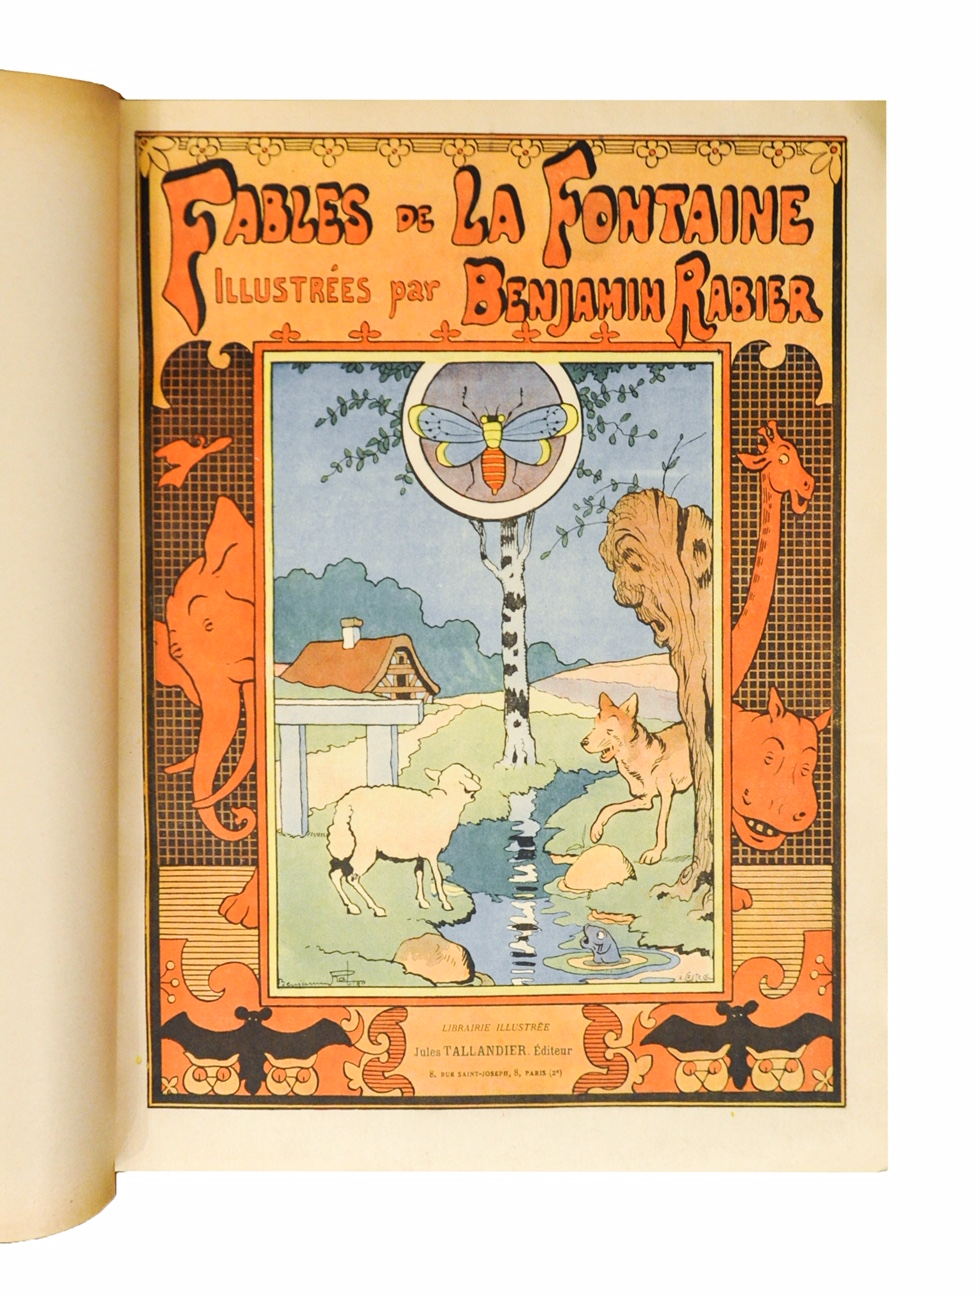 Cautand femeie Riviere- du- Loup)